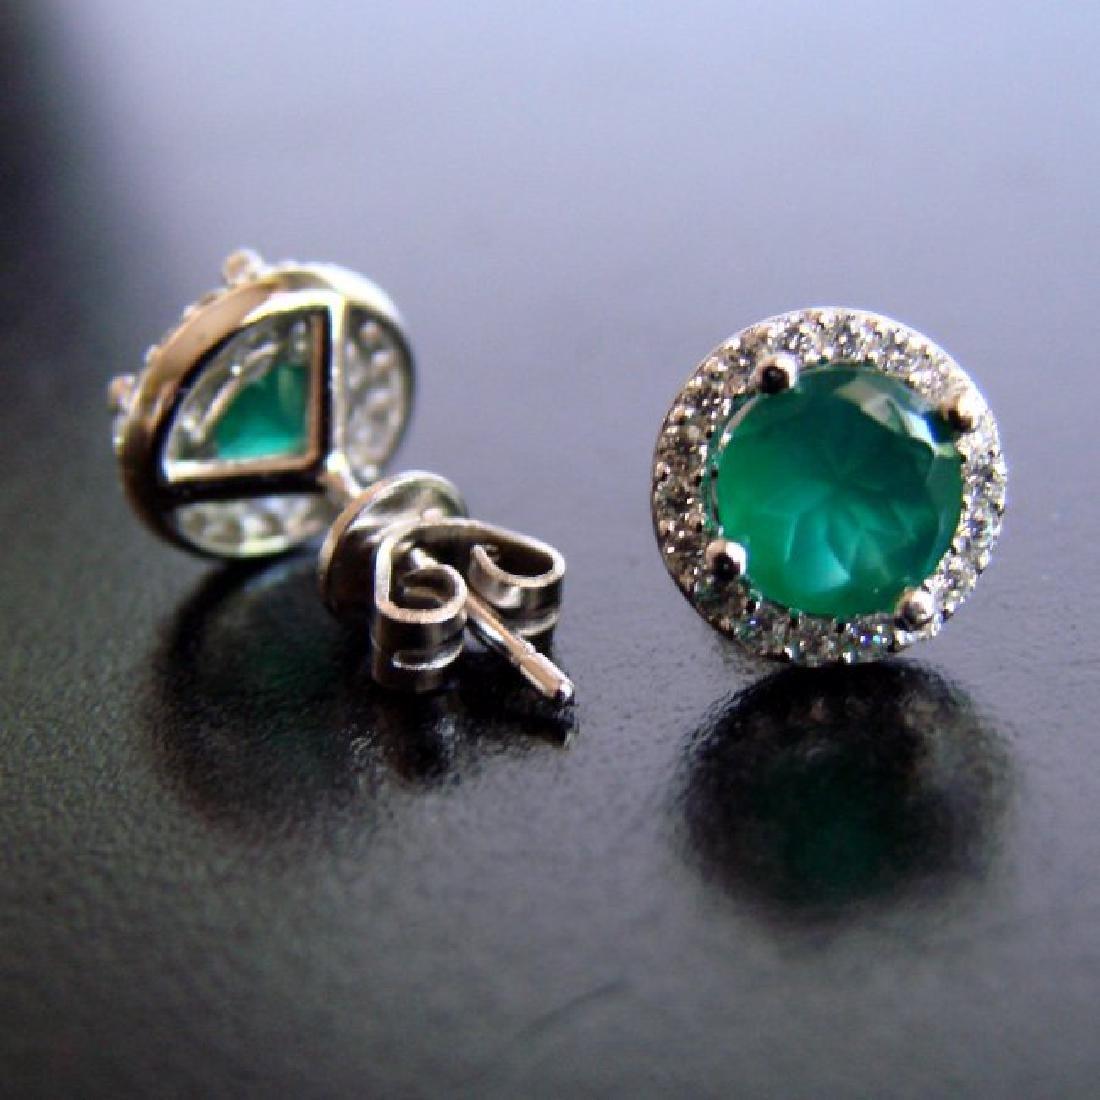 Creation Diamond & Emerald Stud Earring 2.62Ct 18k W/g - 2